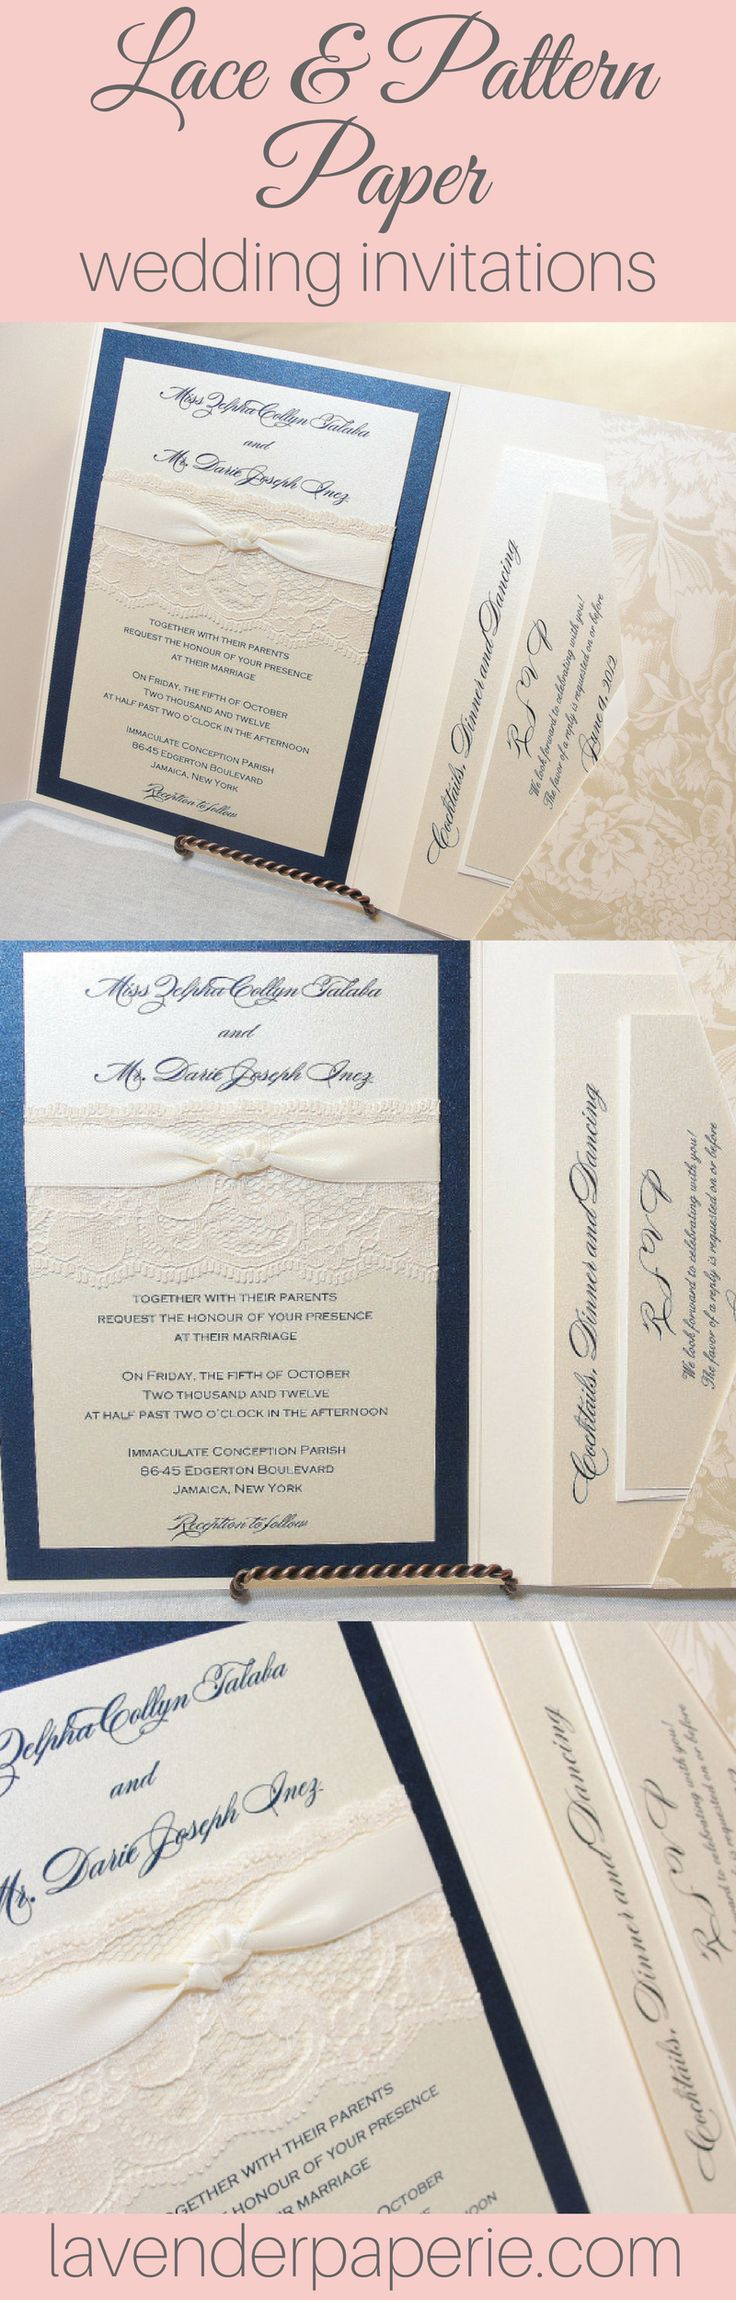 vintage doily wedding invitations%0A Hayley  bloom navy  Wedding Invitation LaceVintage